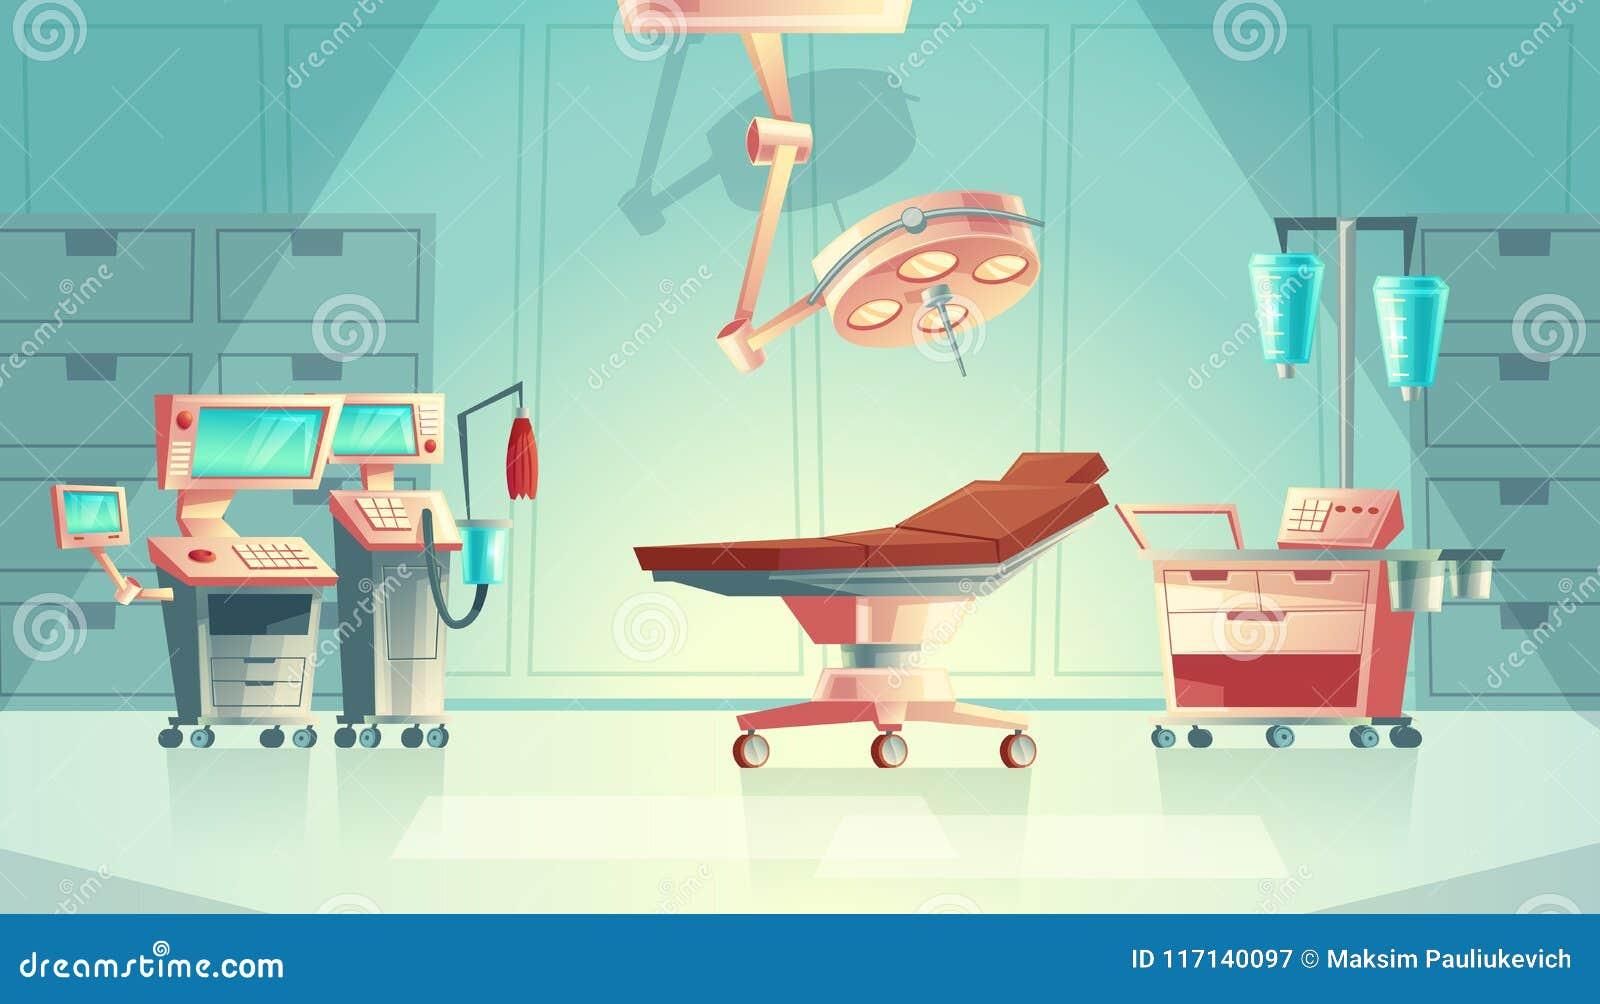 Equipment Cartoons Illustrations Amp Vector Stock Images